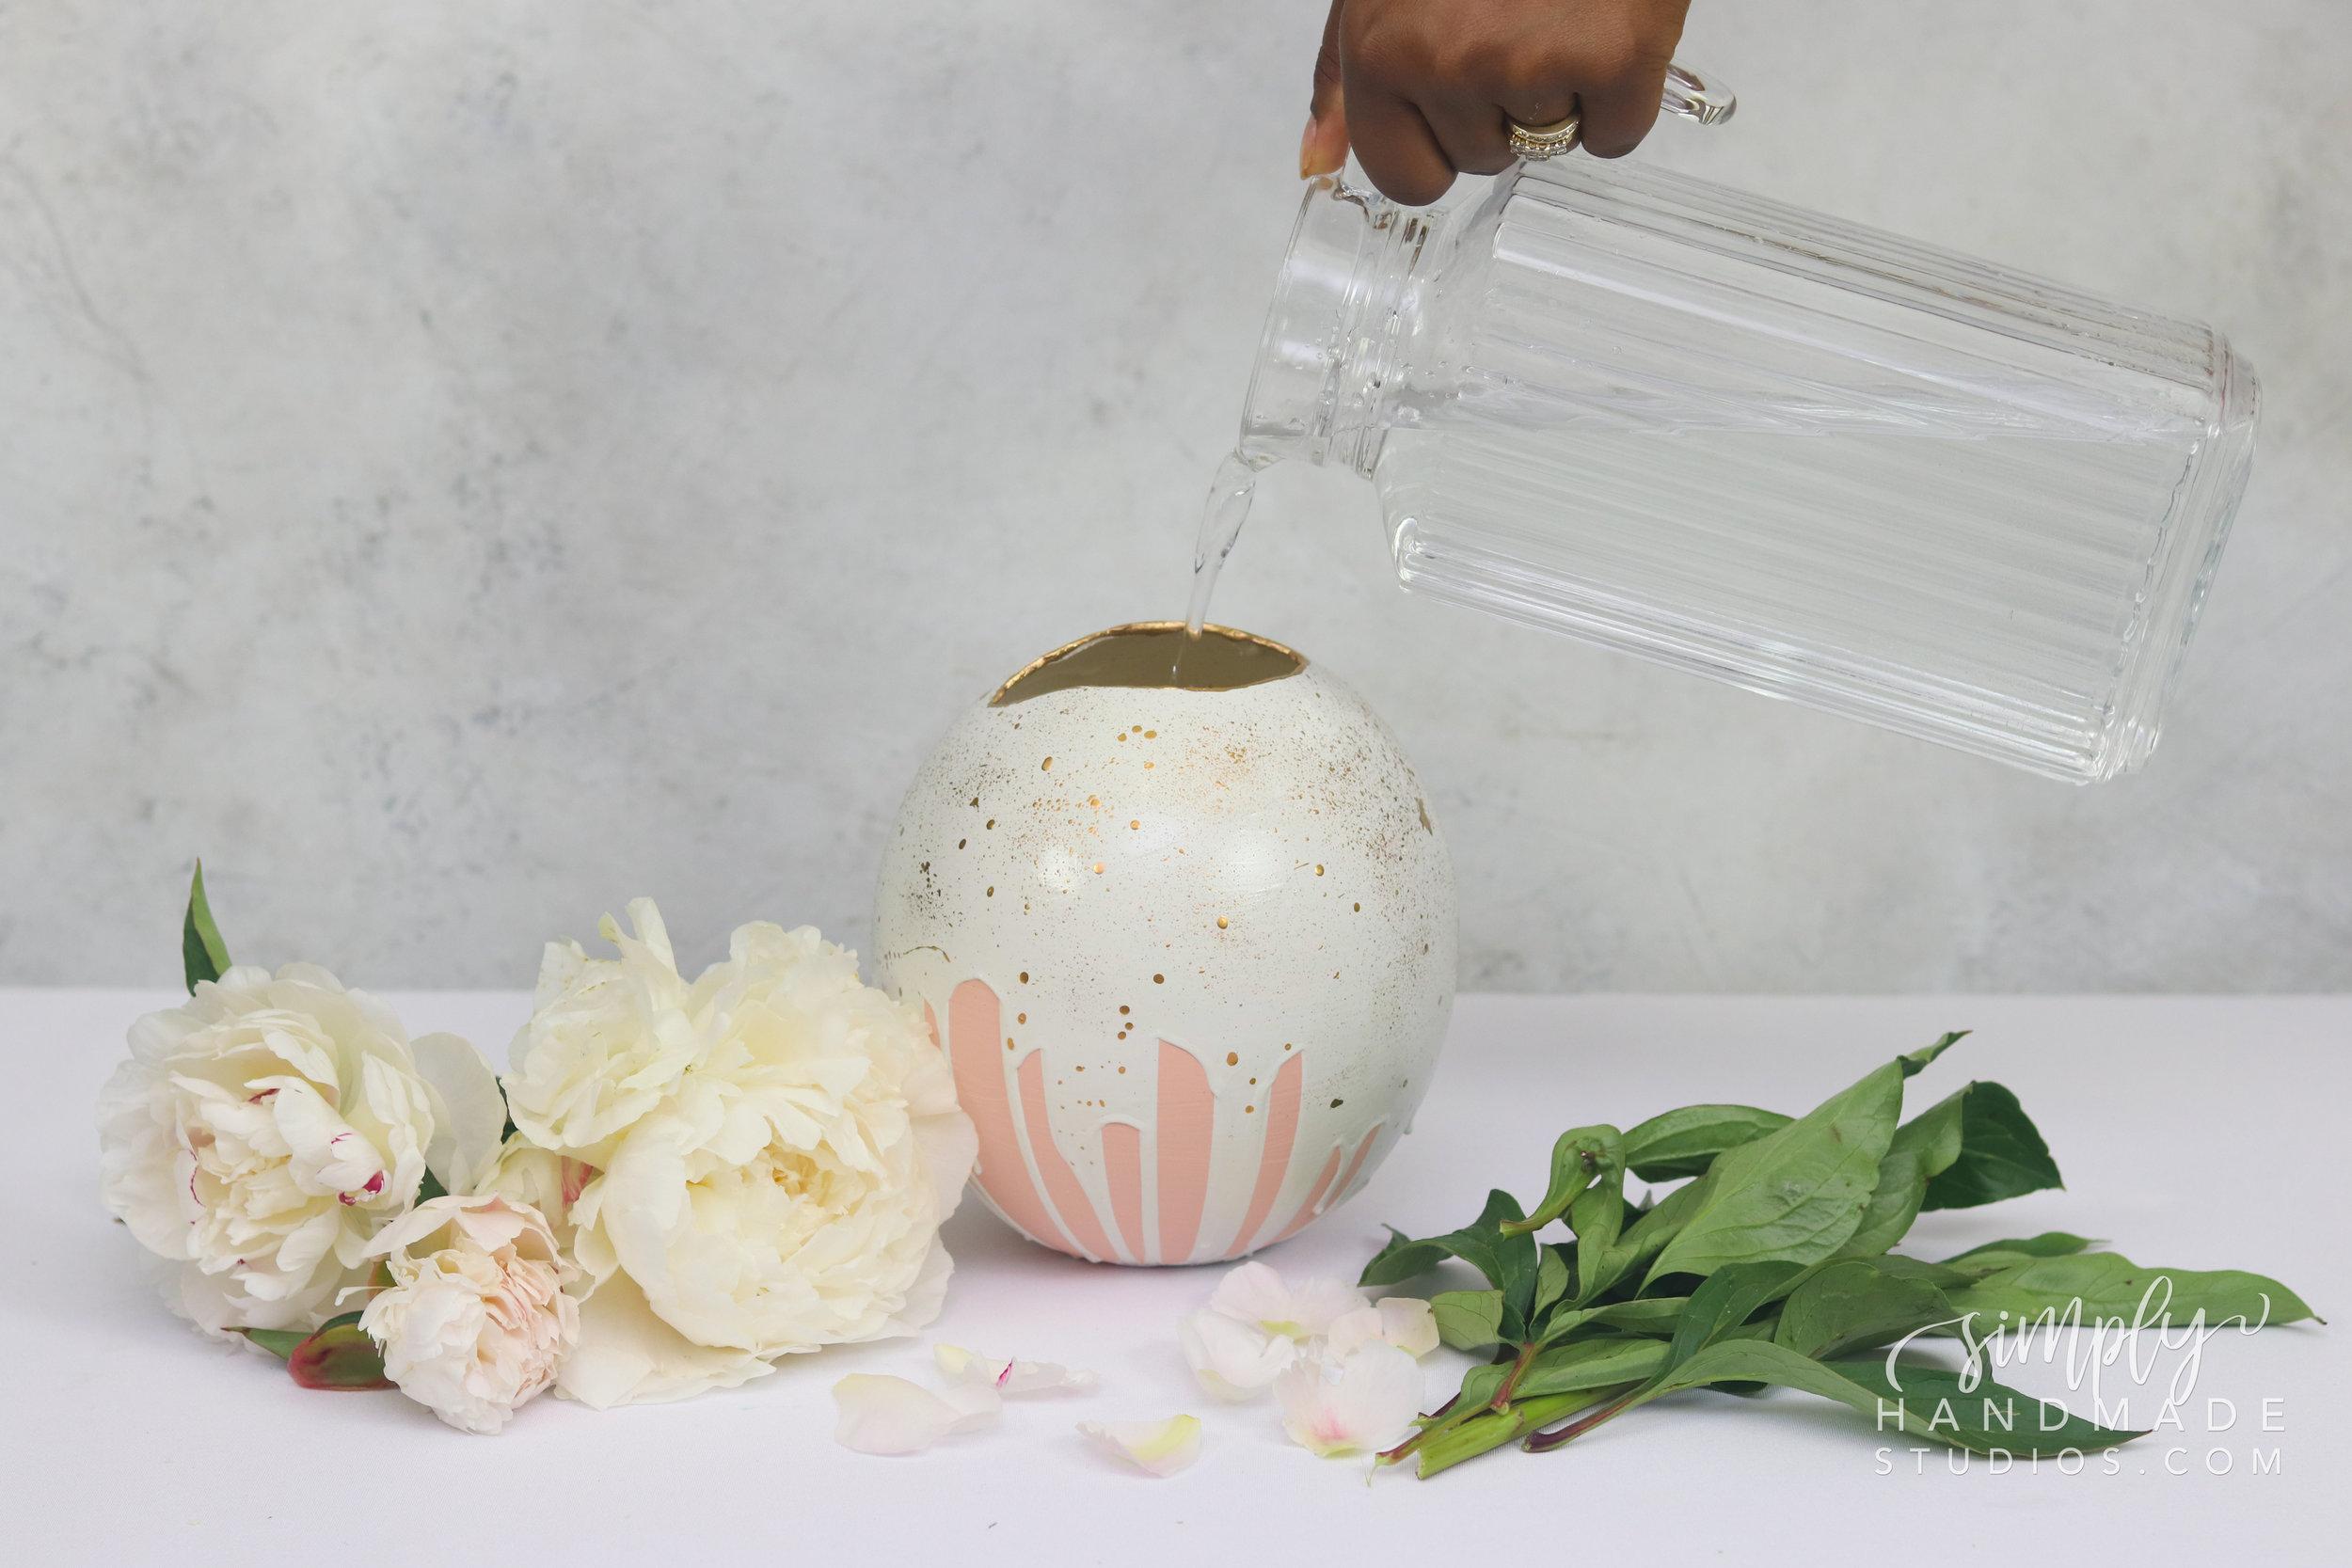 DIY Plaster Flower Vase - Simply Handmade Studios